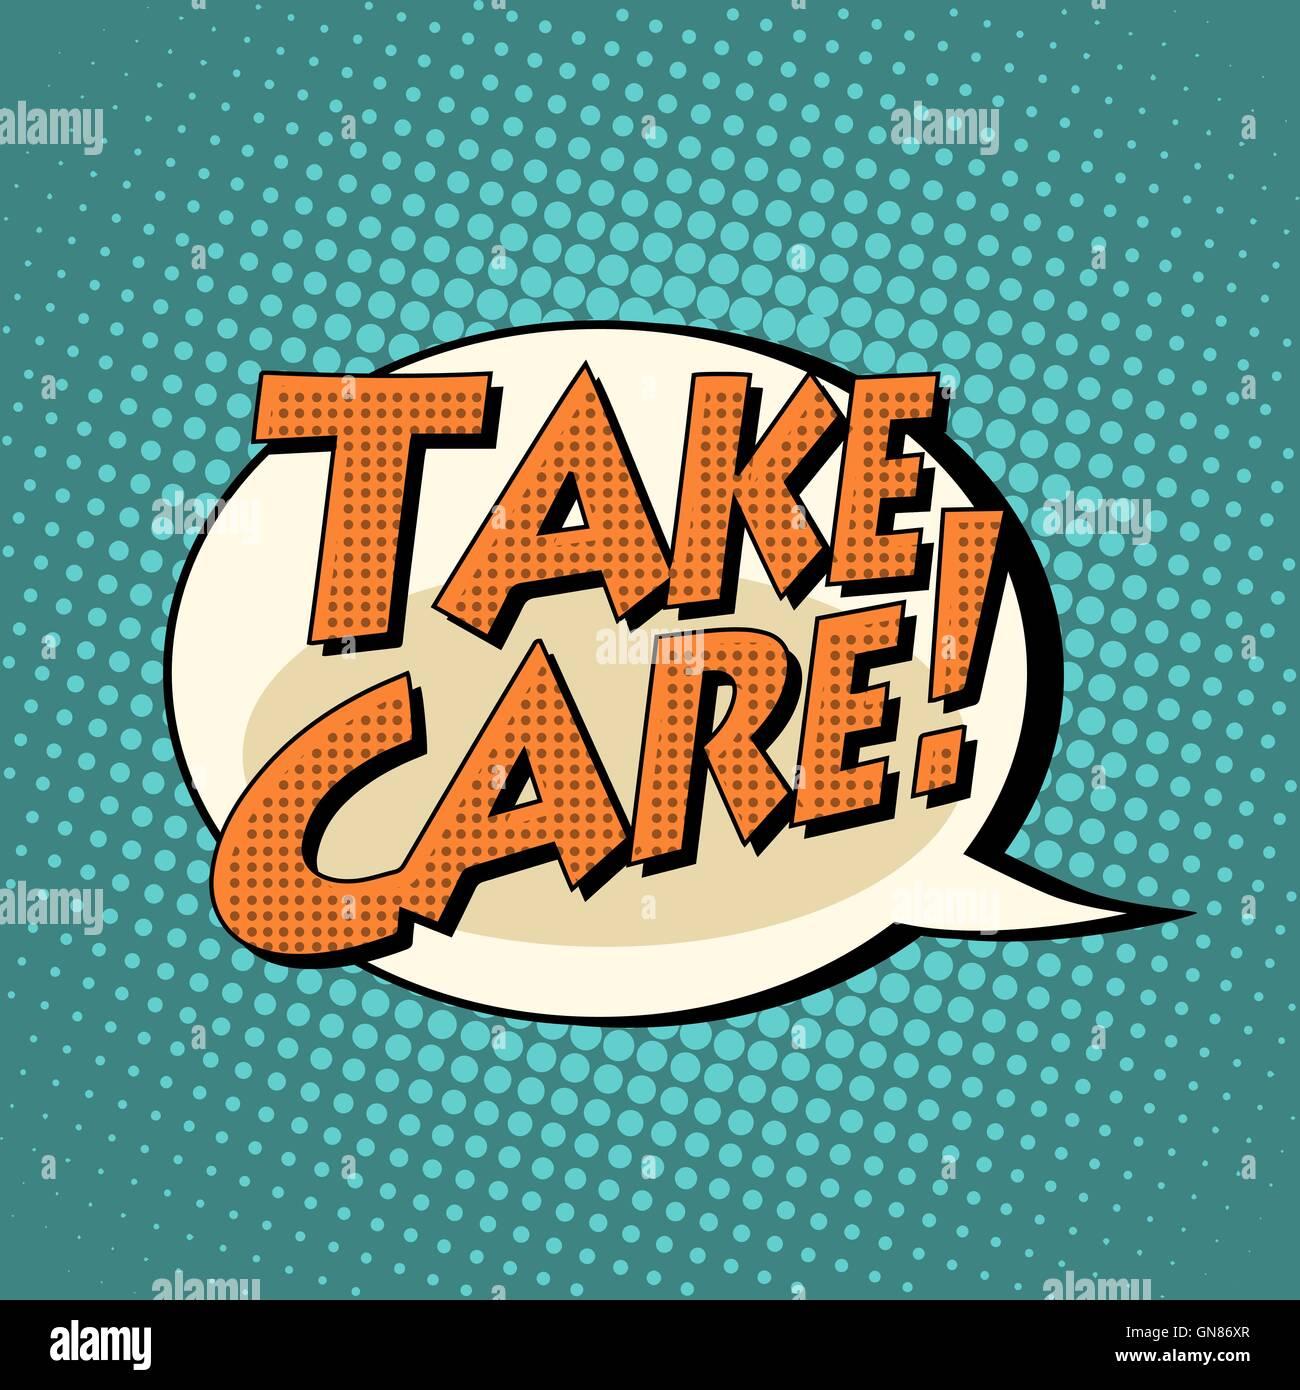 take care comic book bubble text - Stock Image